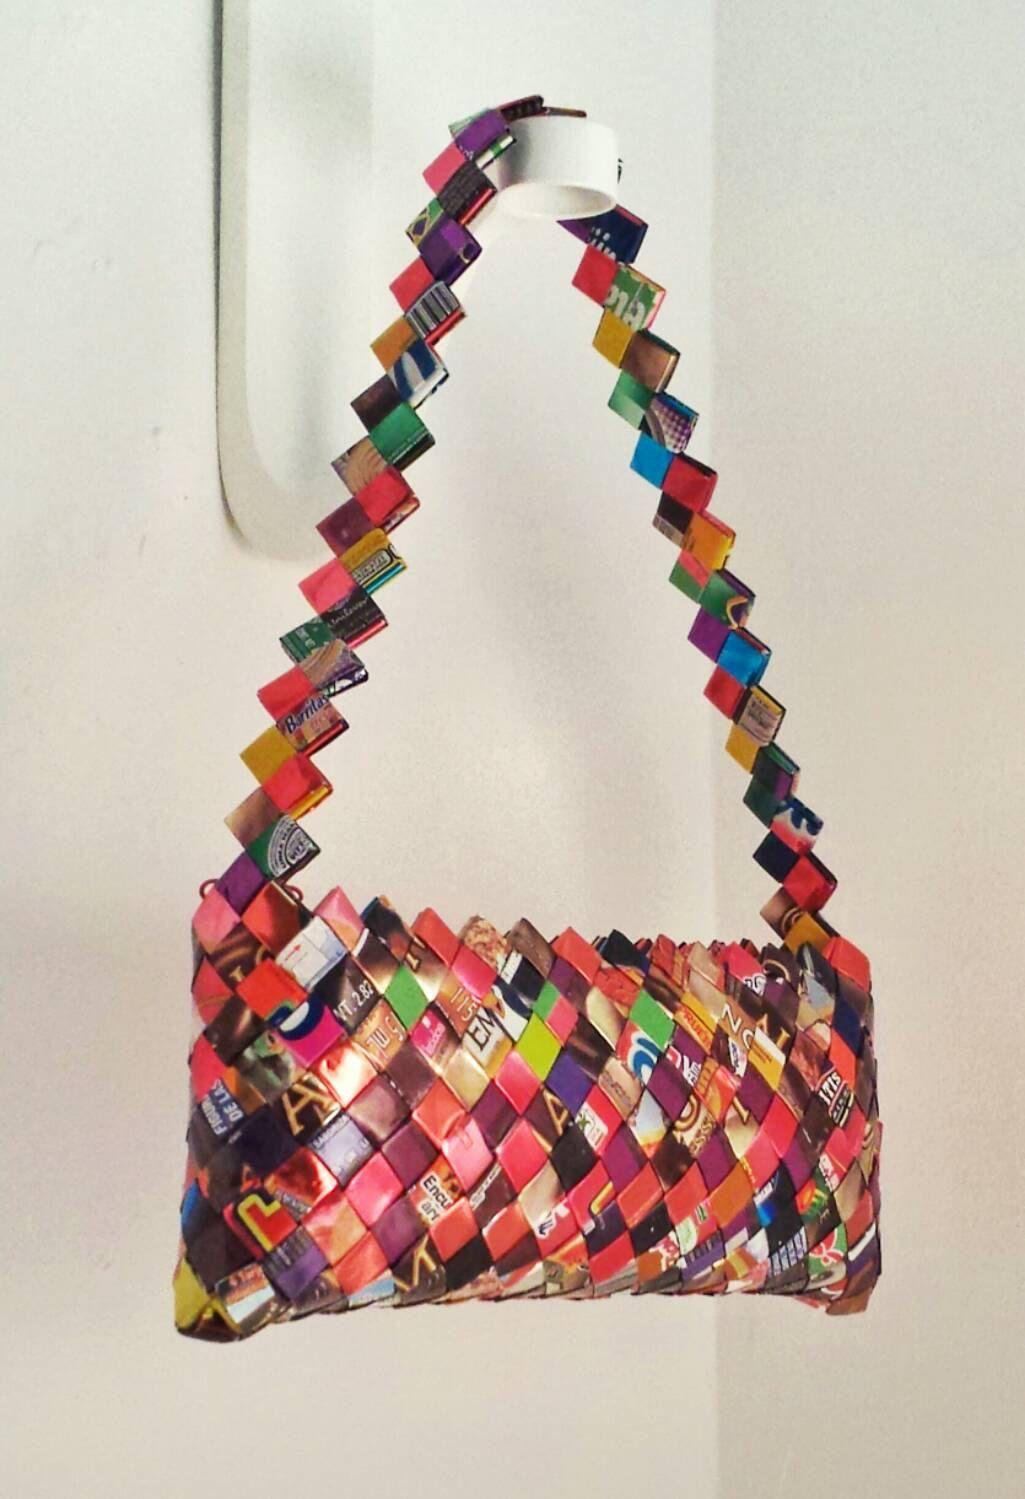 b0ec0c174c Bags That Will Make You Nostalgic – Throwback Purses